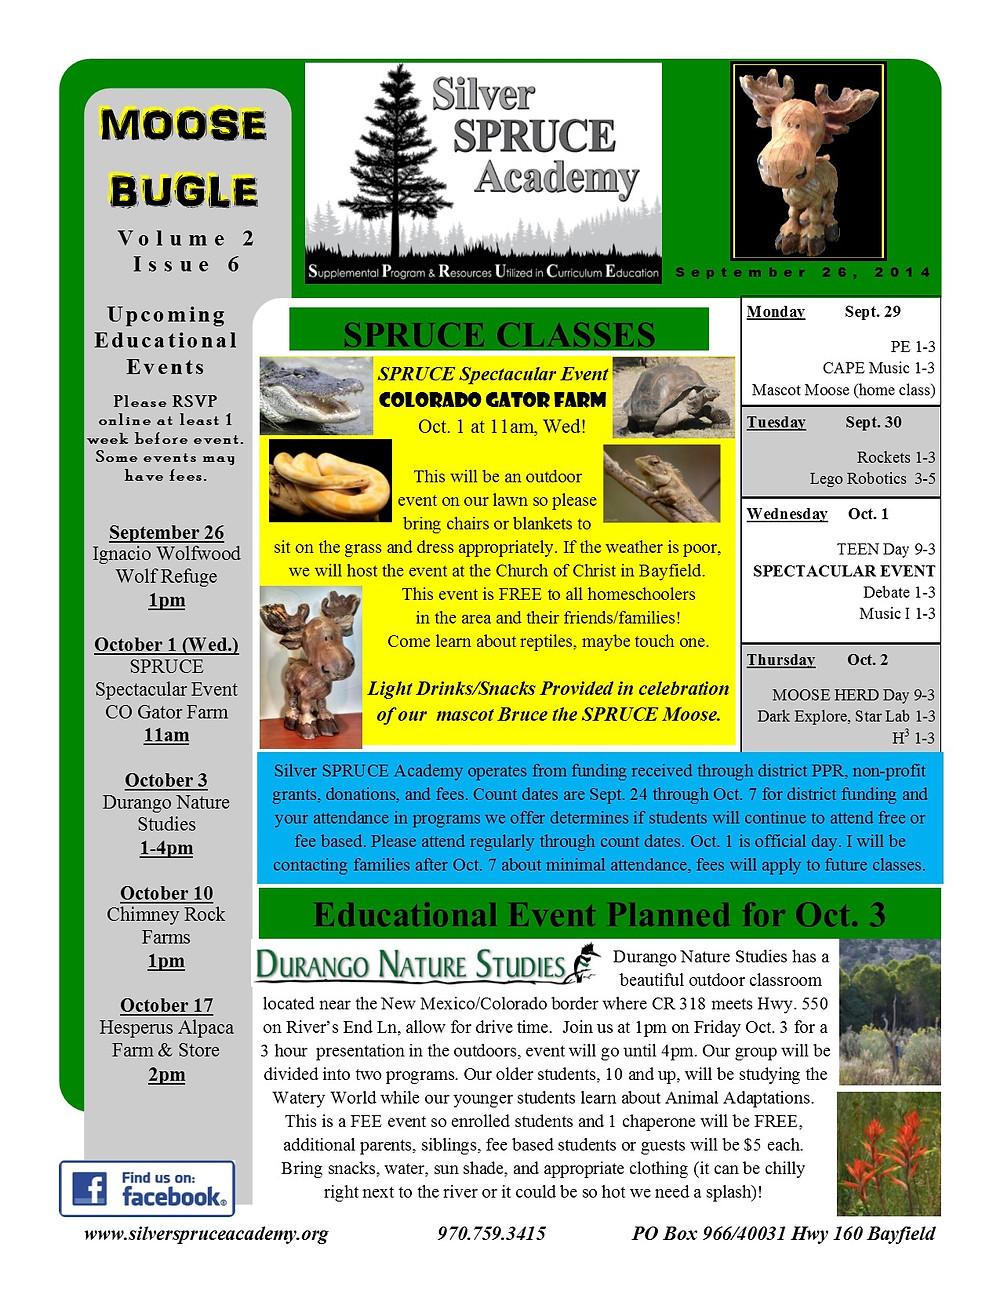 Moose Bugle 9-26-14 Page 1.jpg